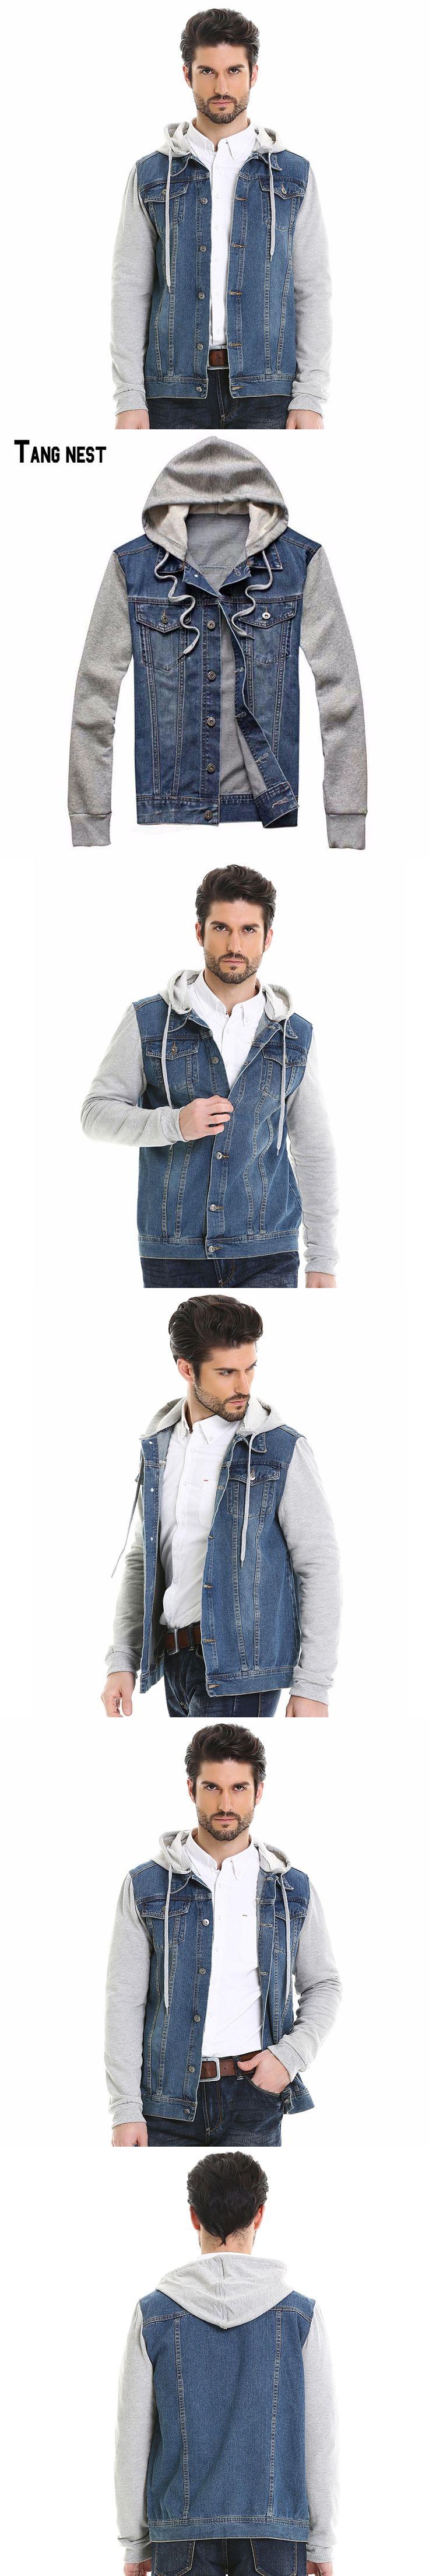 TANGNEST 2017 New Fashion Men's Hoodie Cowboy Jeans Jackets Male Denim Plus Size Jeans Jacket Hoodie Detachable MWJ1291